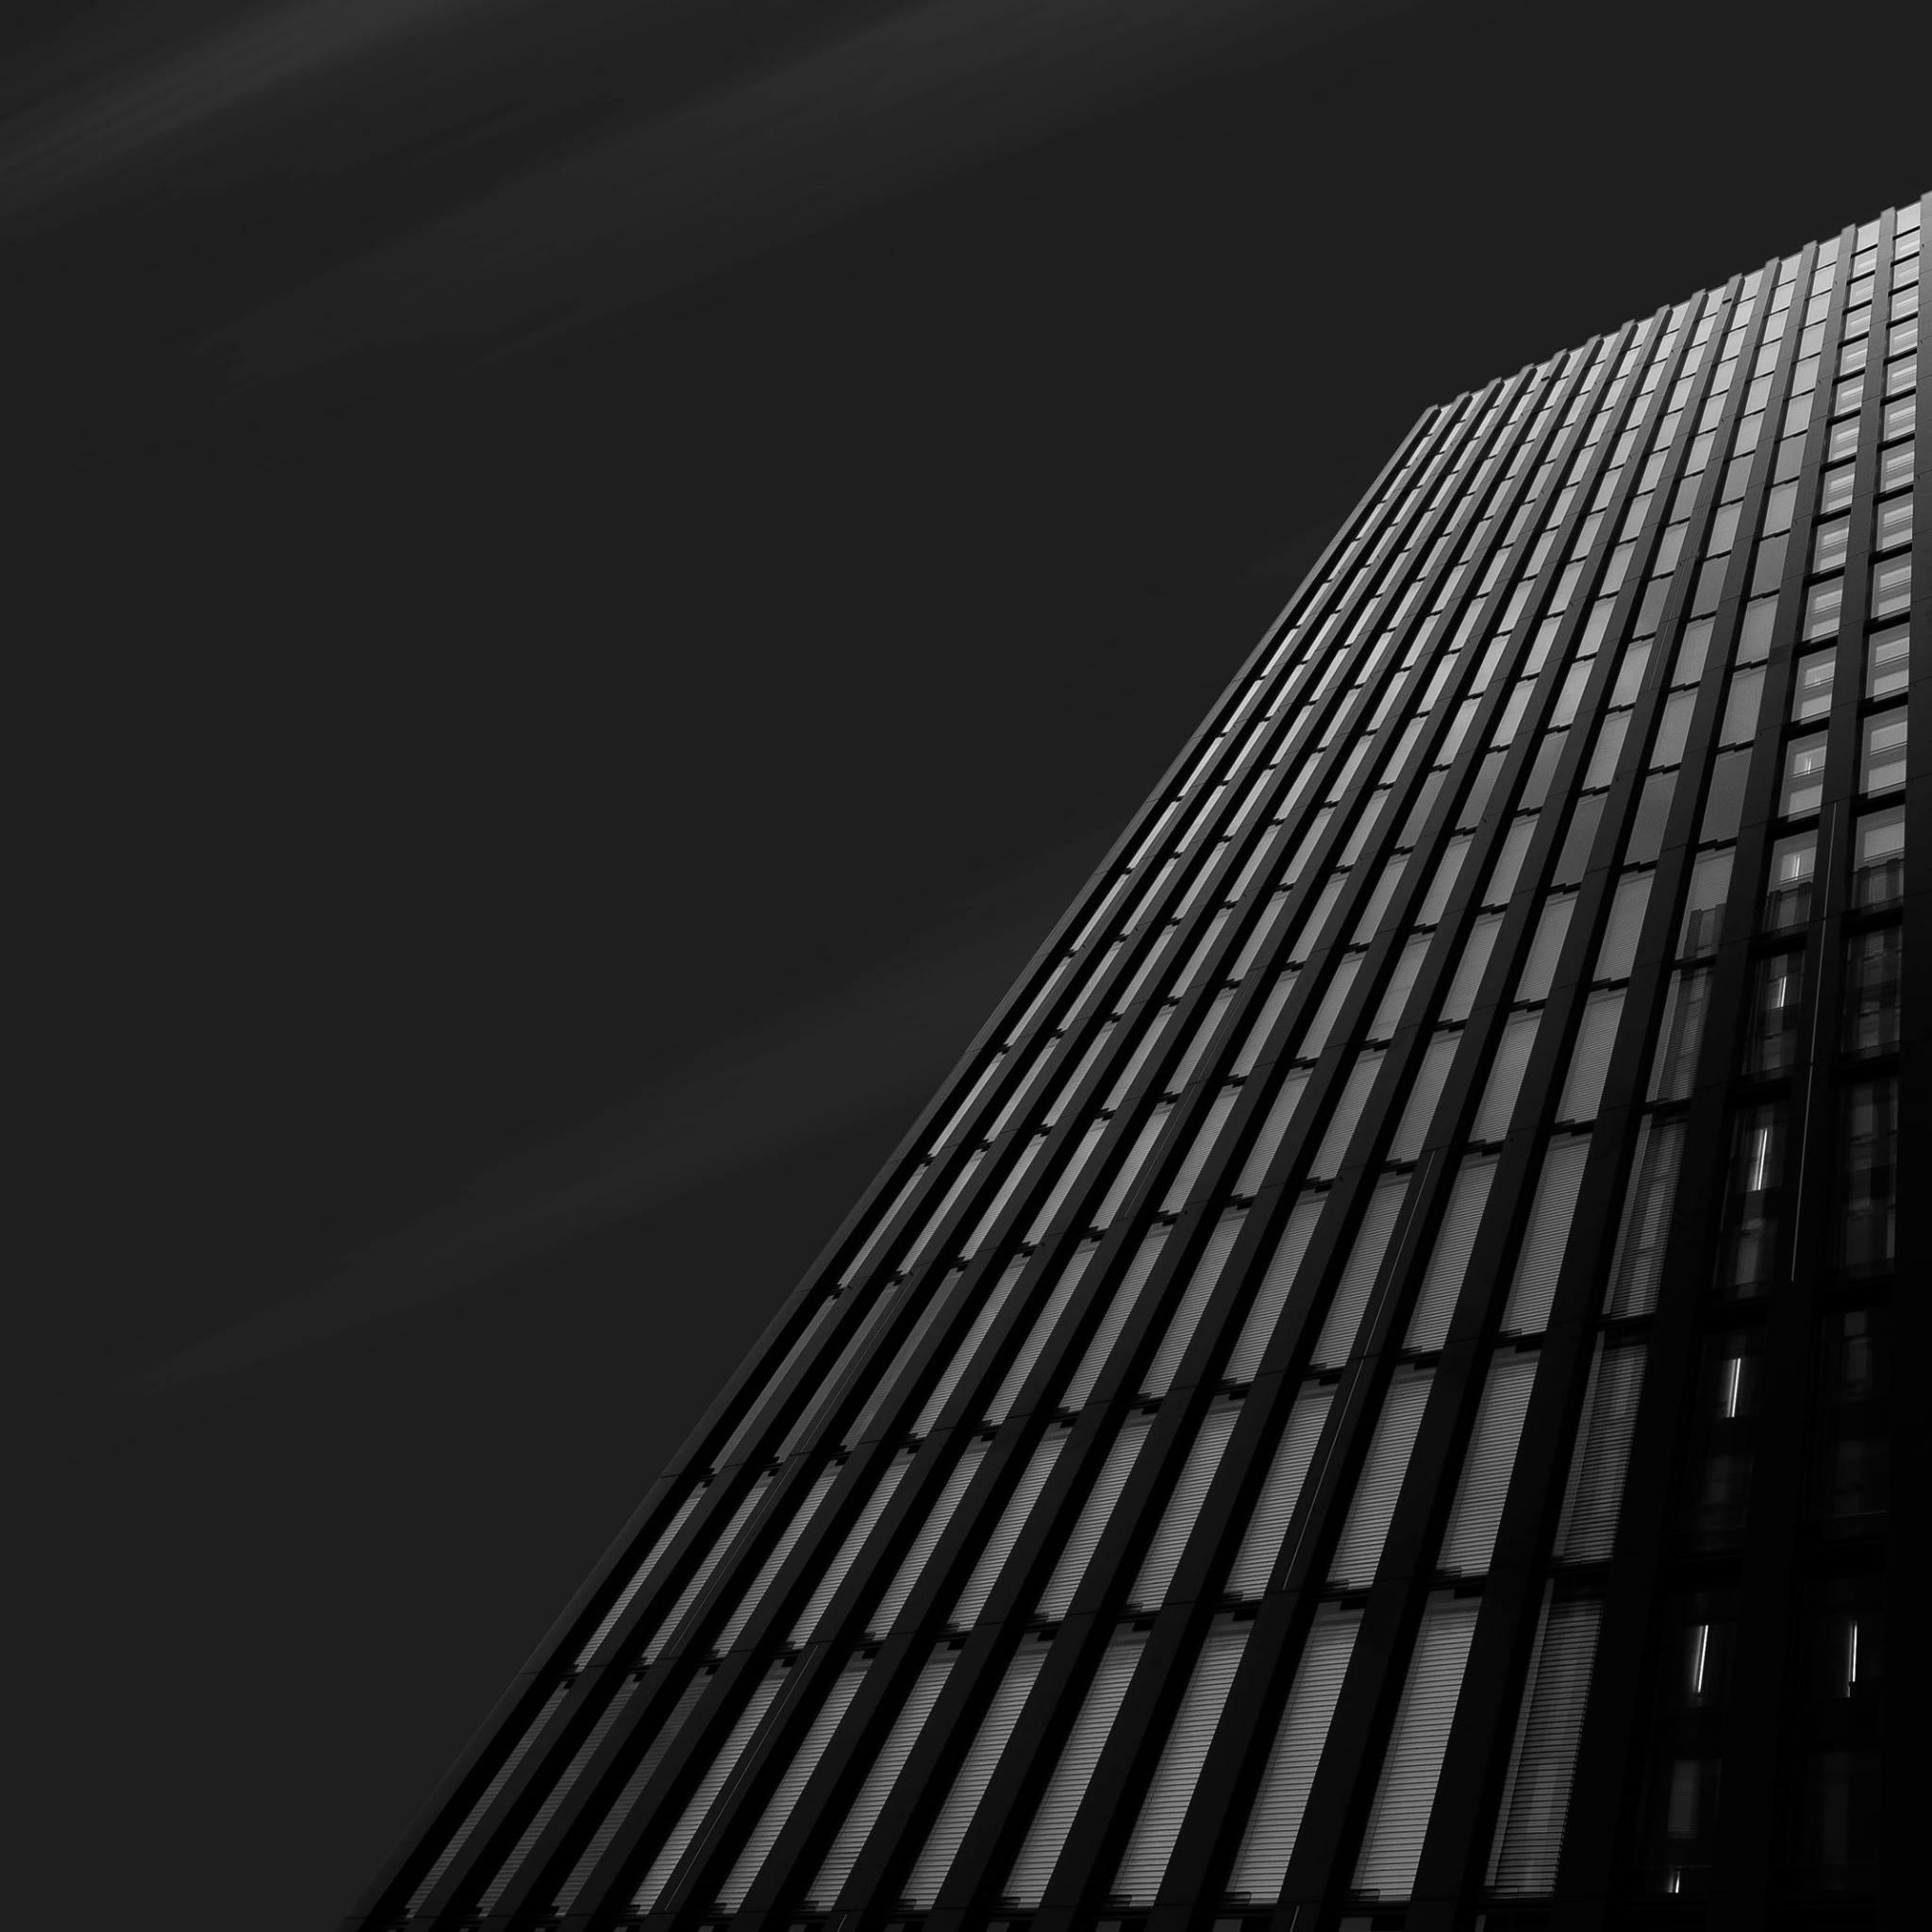 kevin-krautgartner-architecture-photography-01